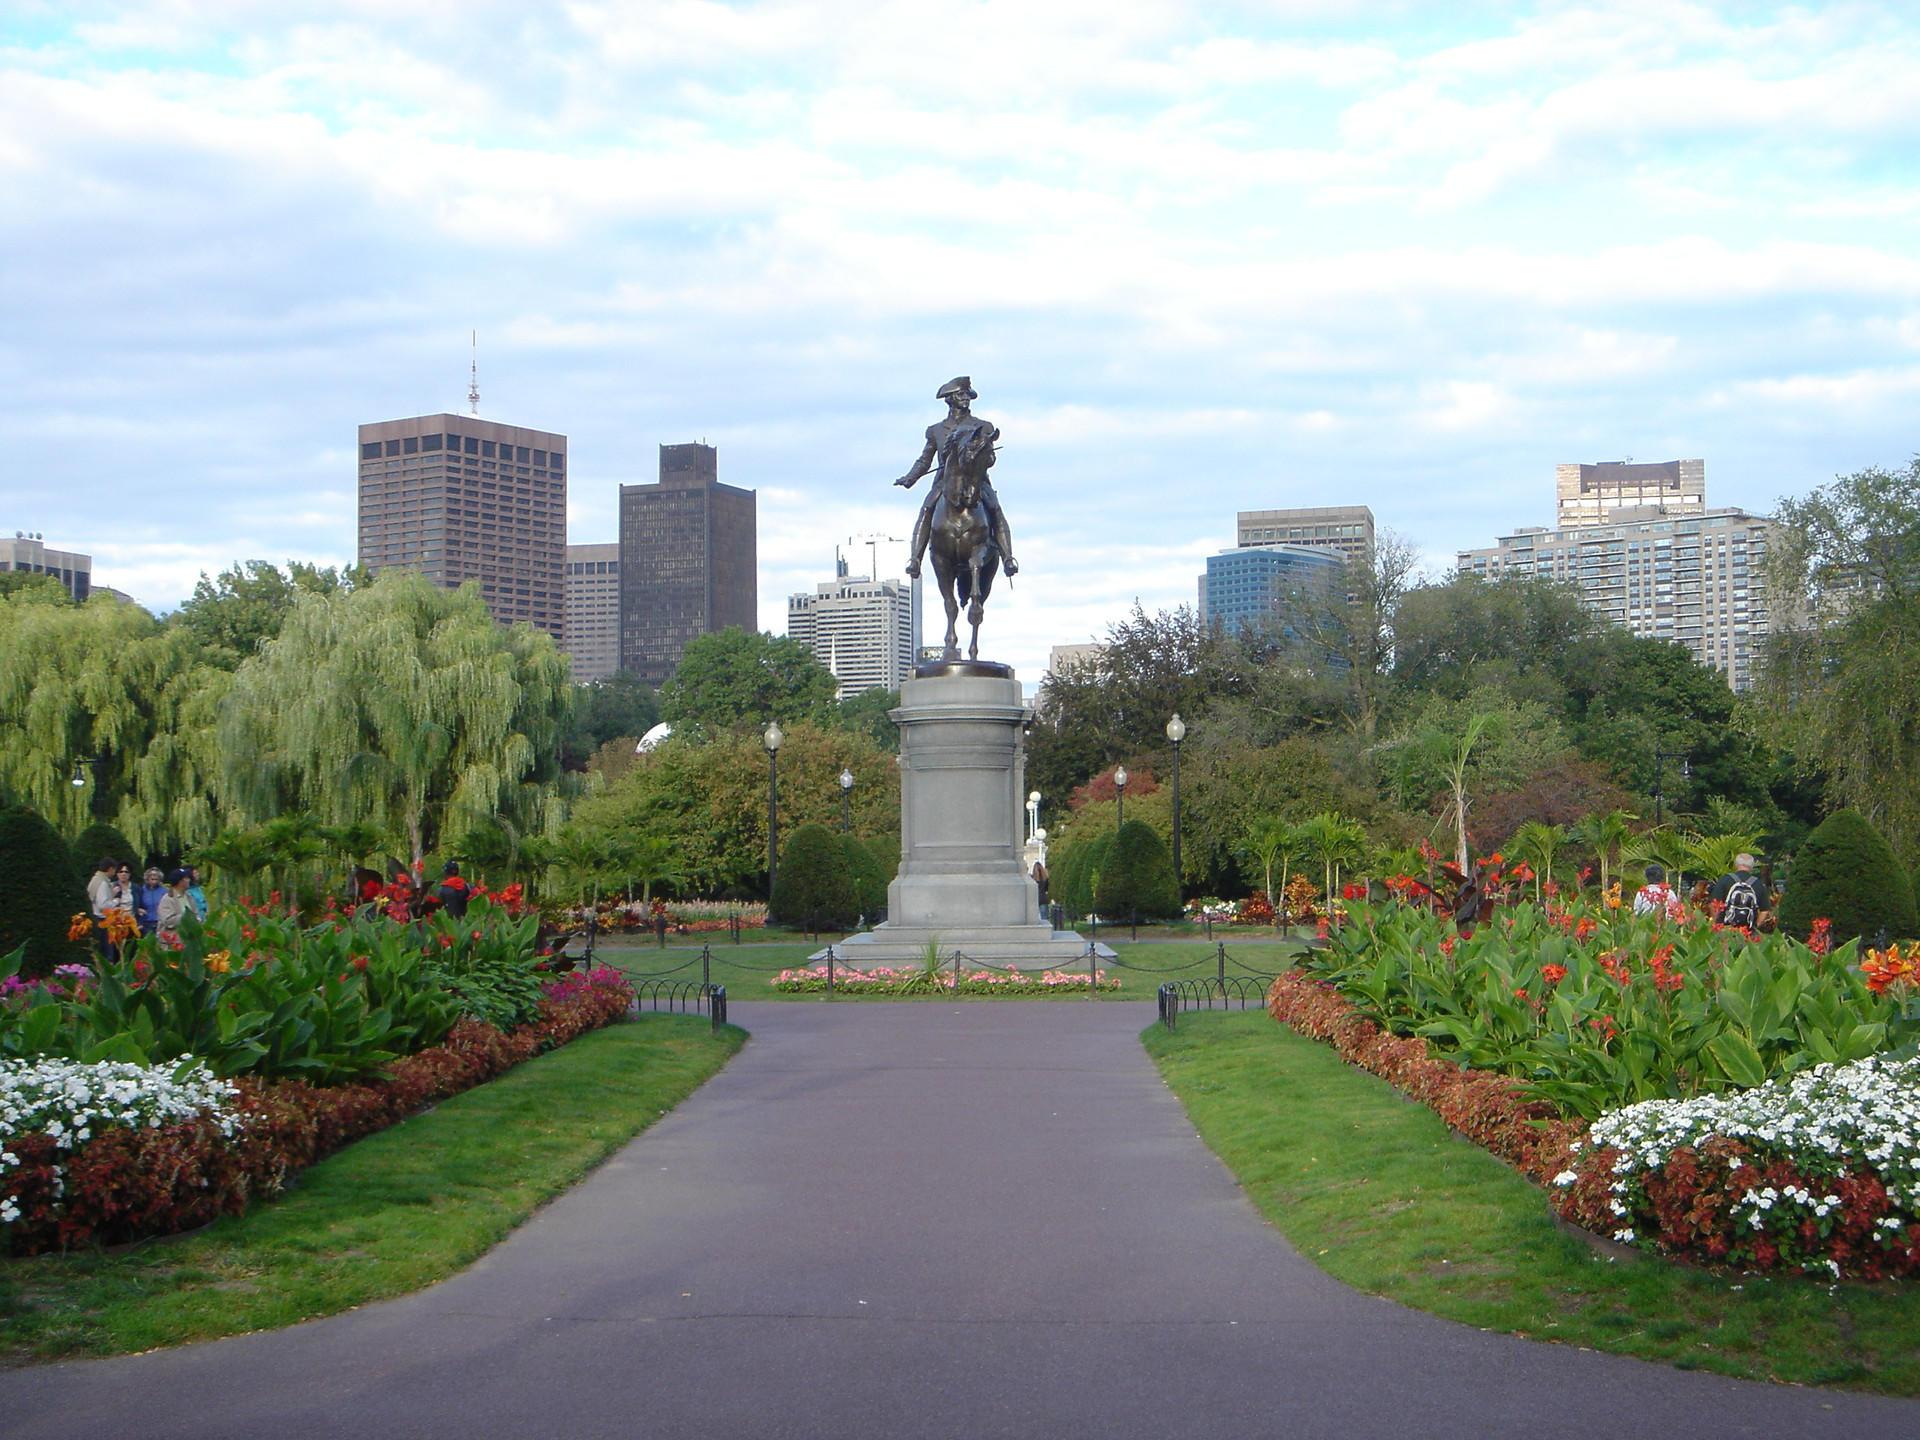 a statue in a garden